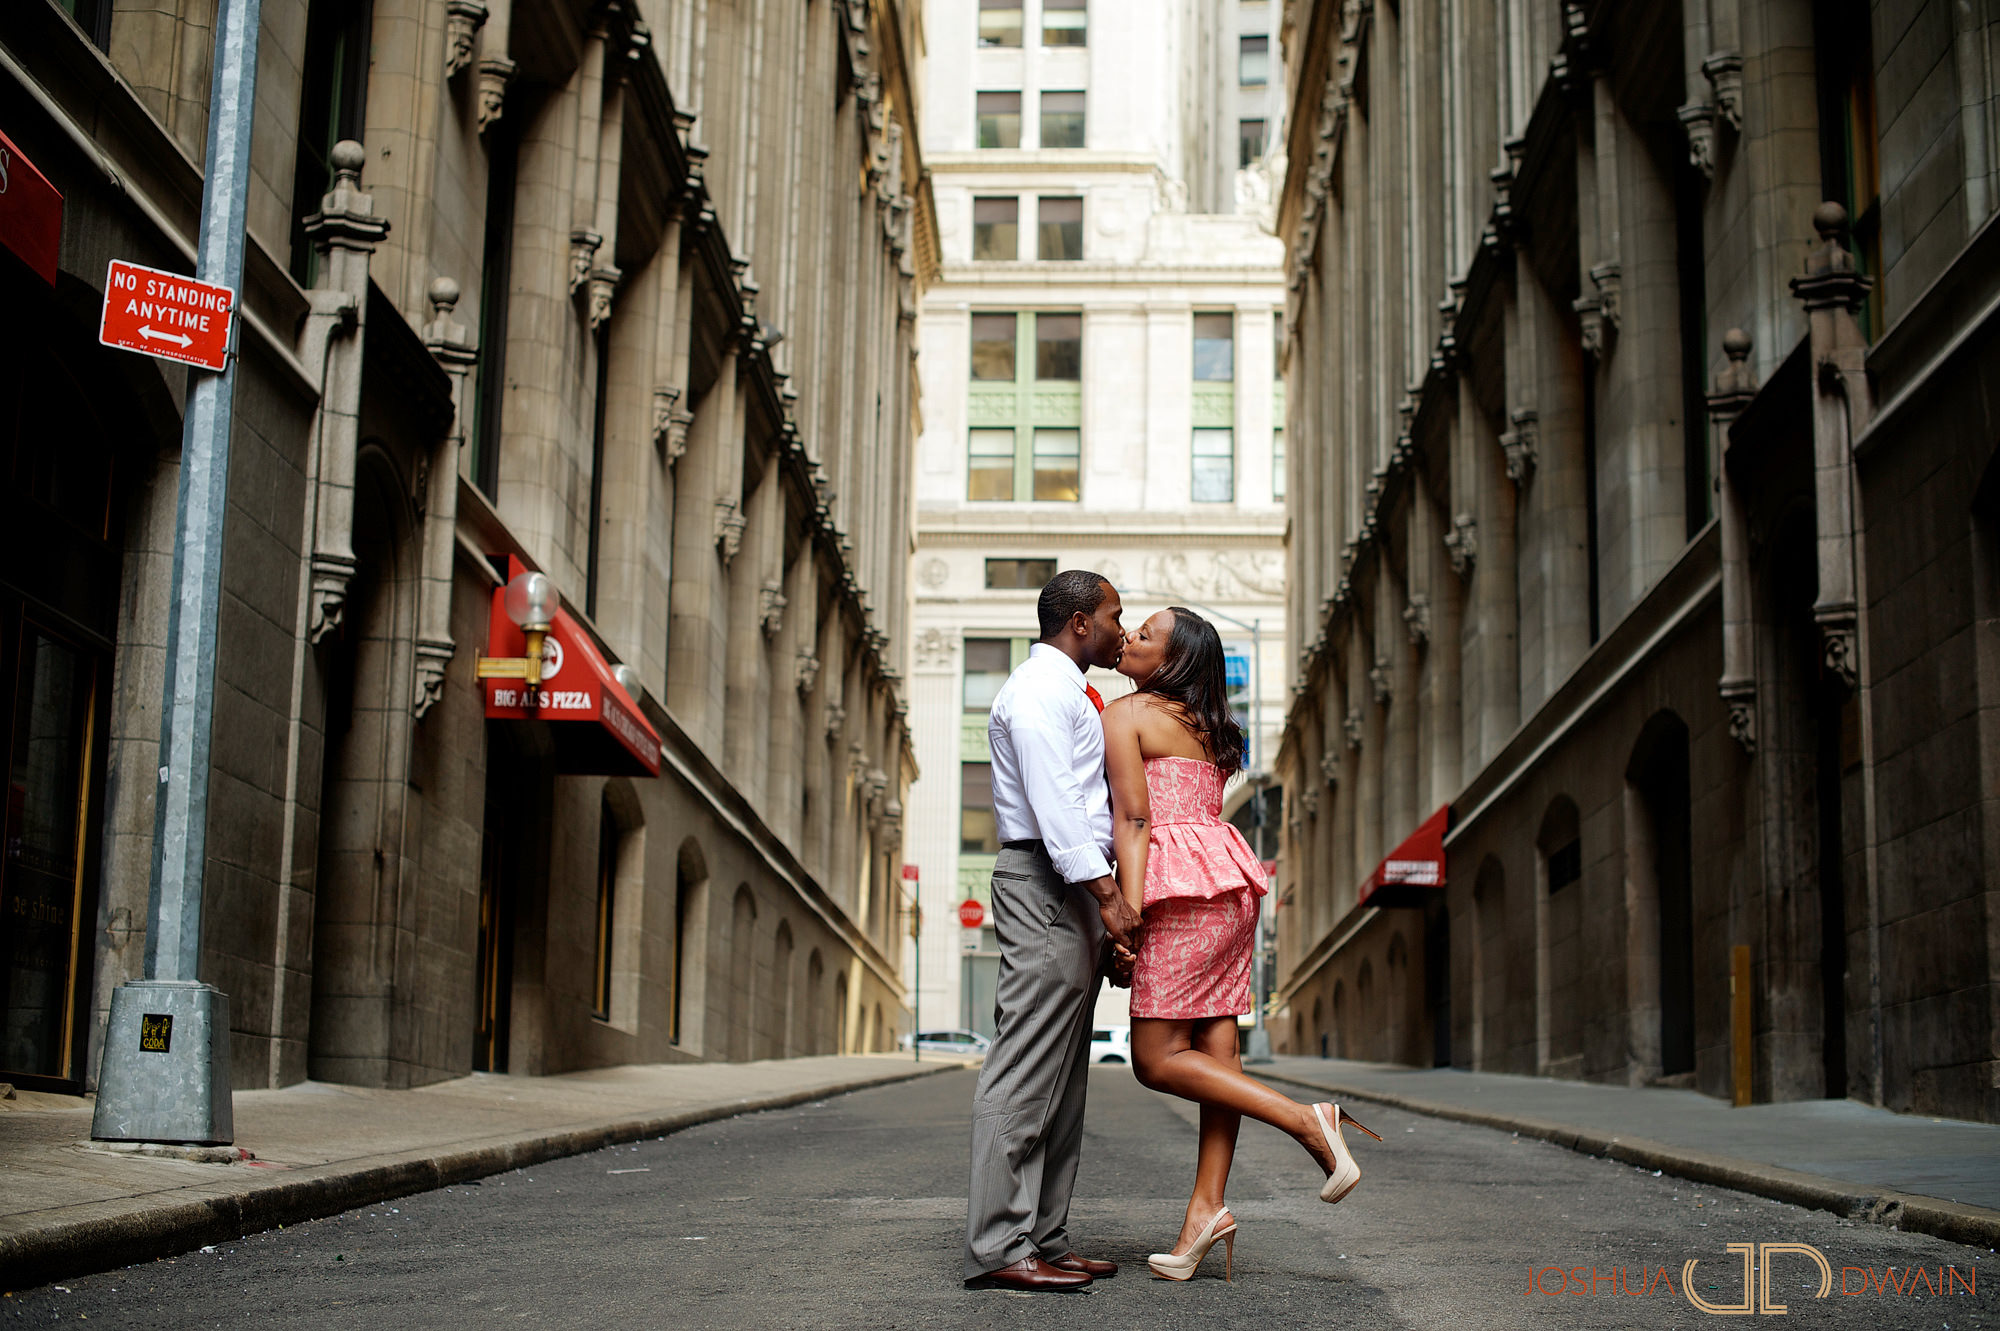 charisse-haynes-001-lower-manhattan-New-York-City-engagement-photographer-joshua-dwain